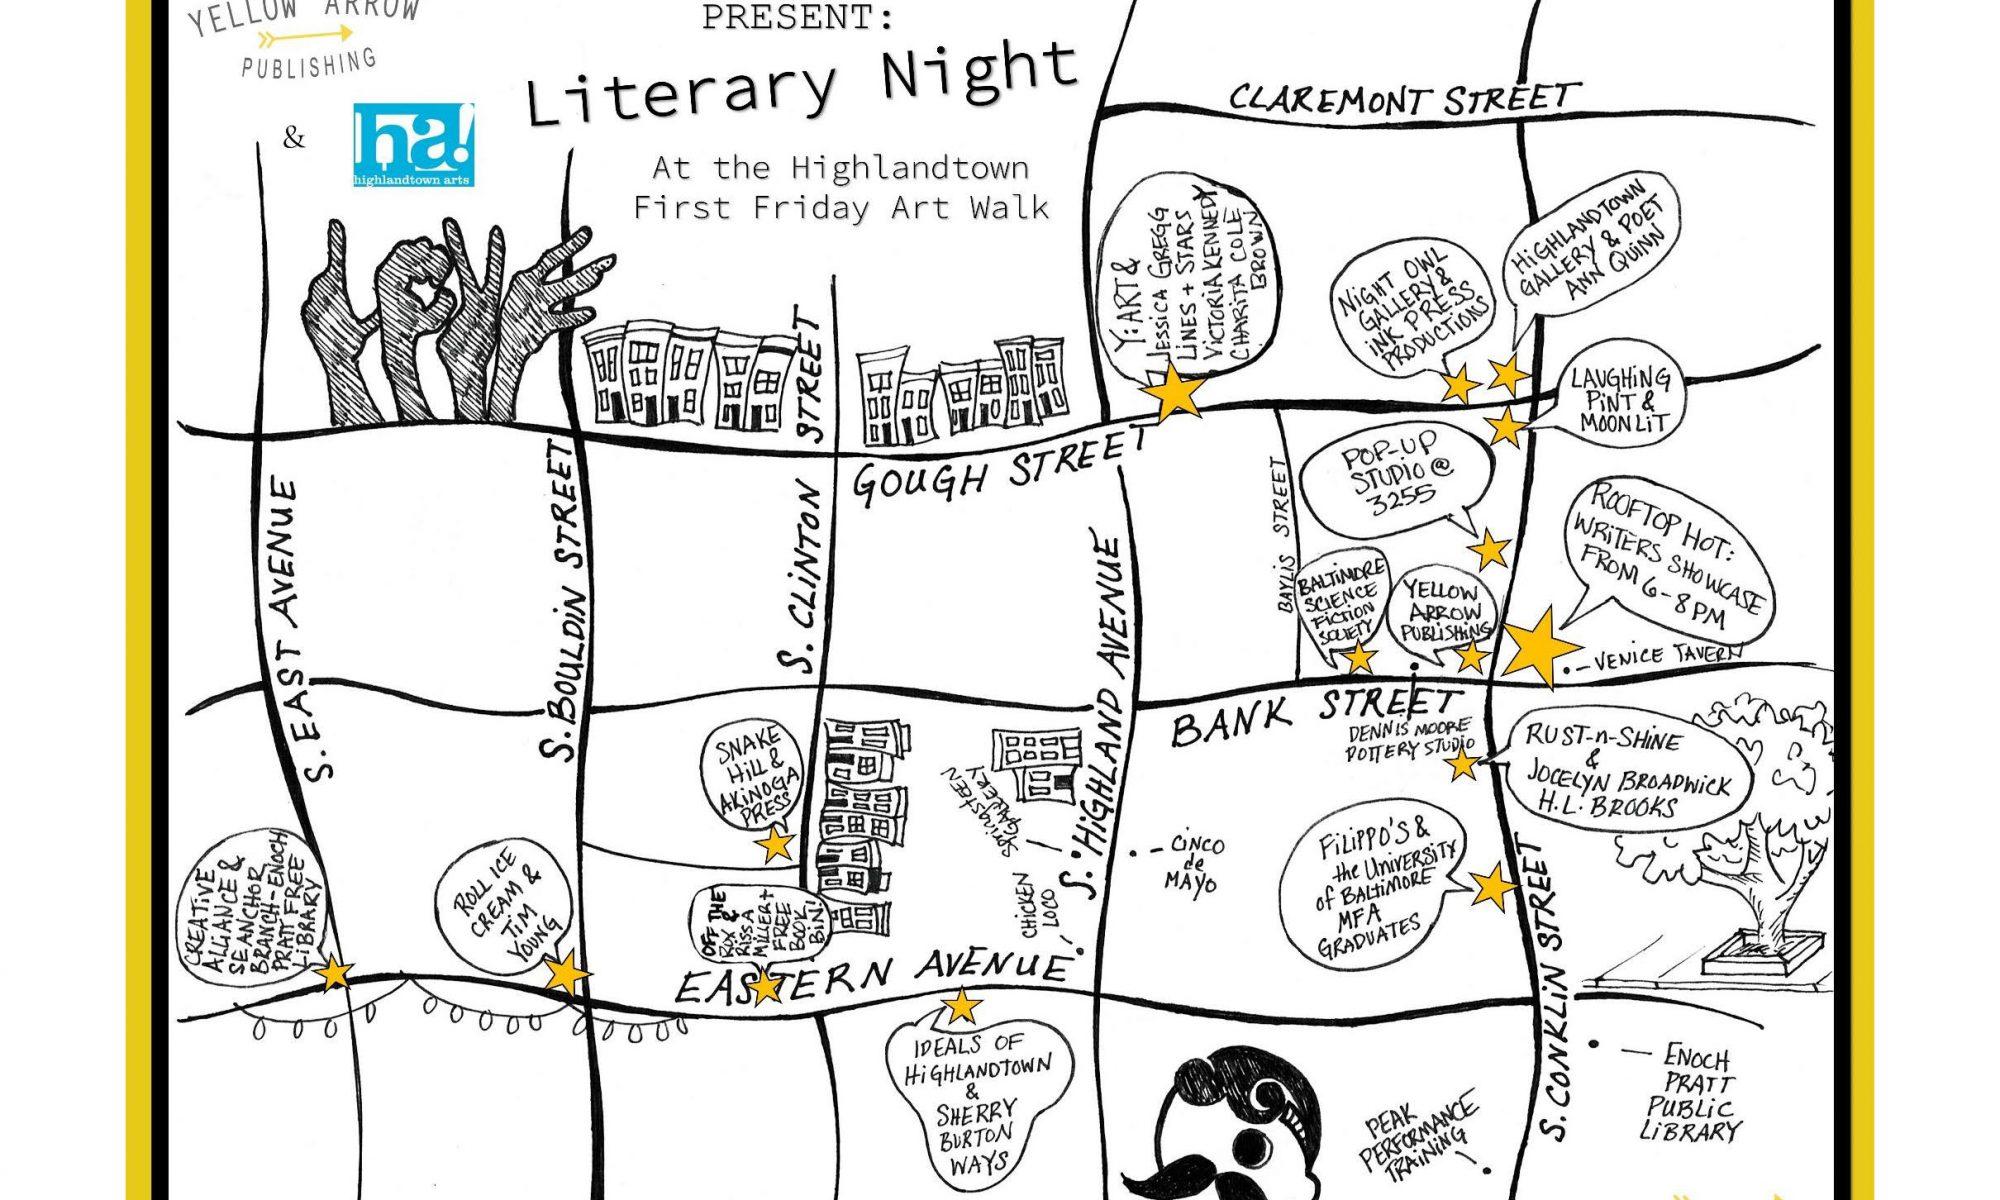 First Friday Art Walk: Aug 2 (LITERARY NIGHT!)